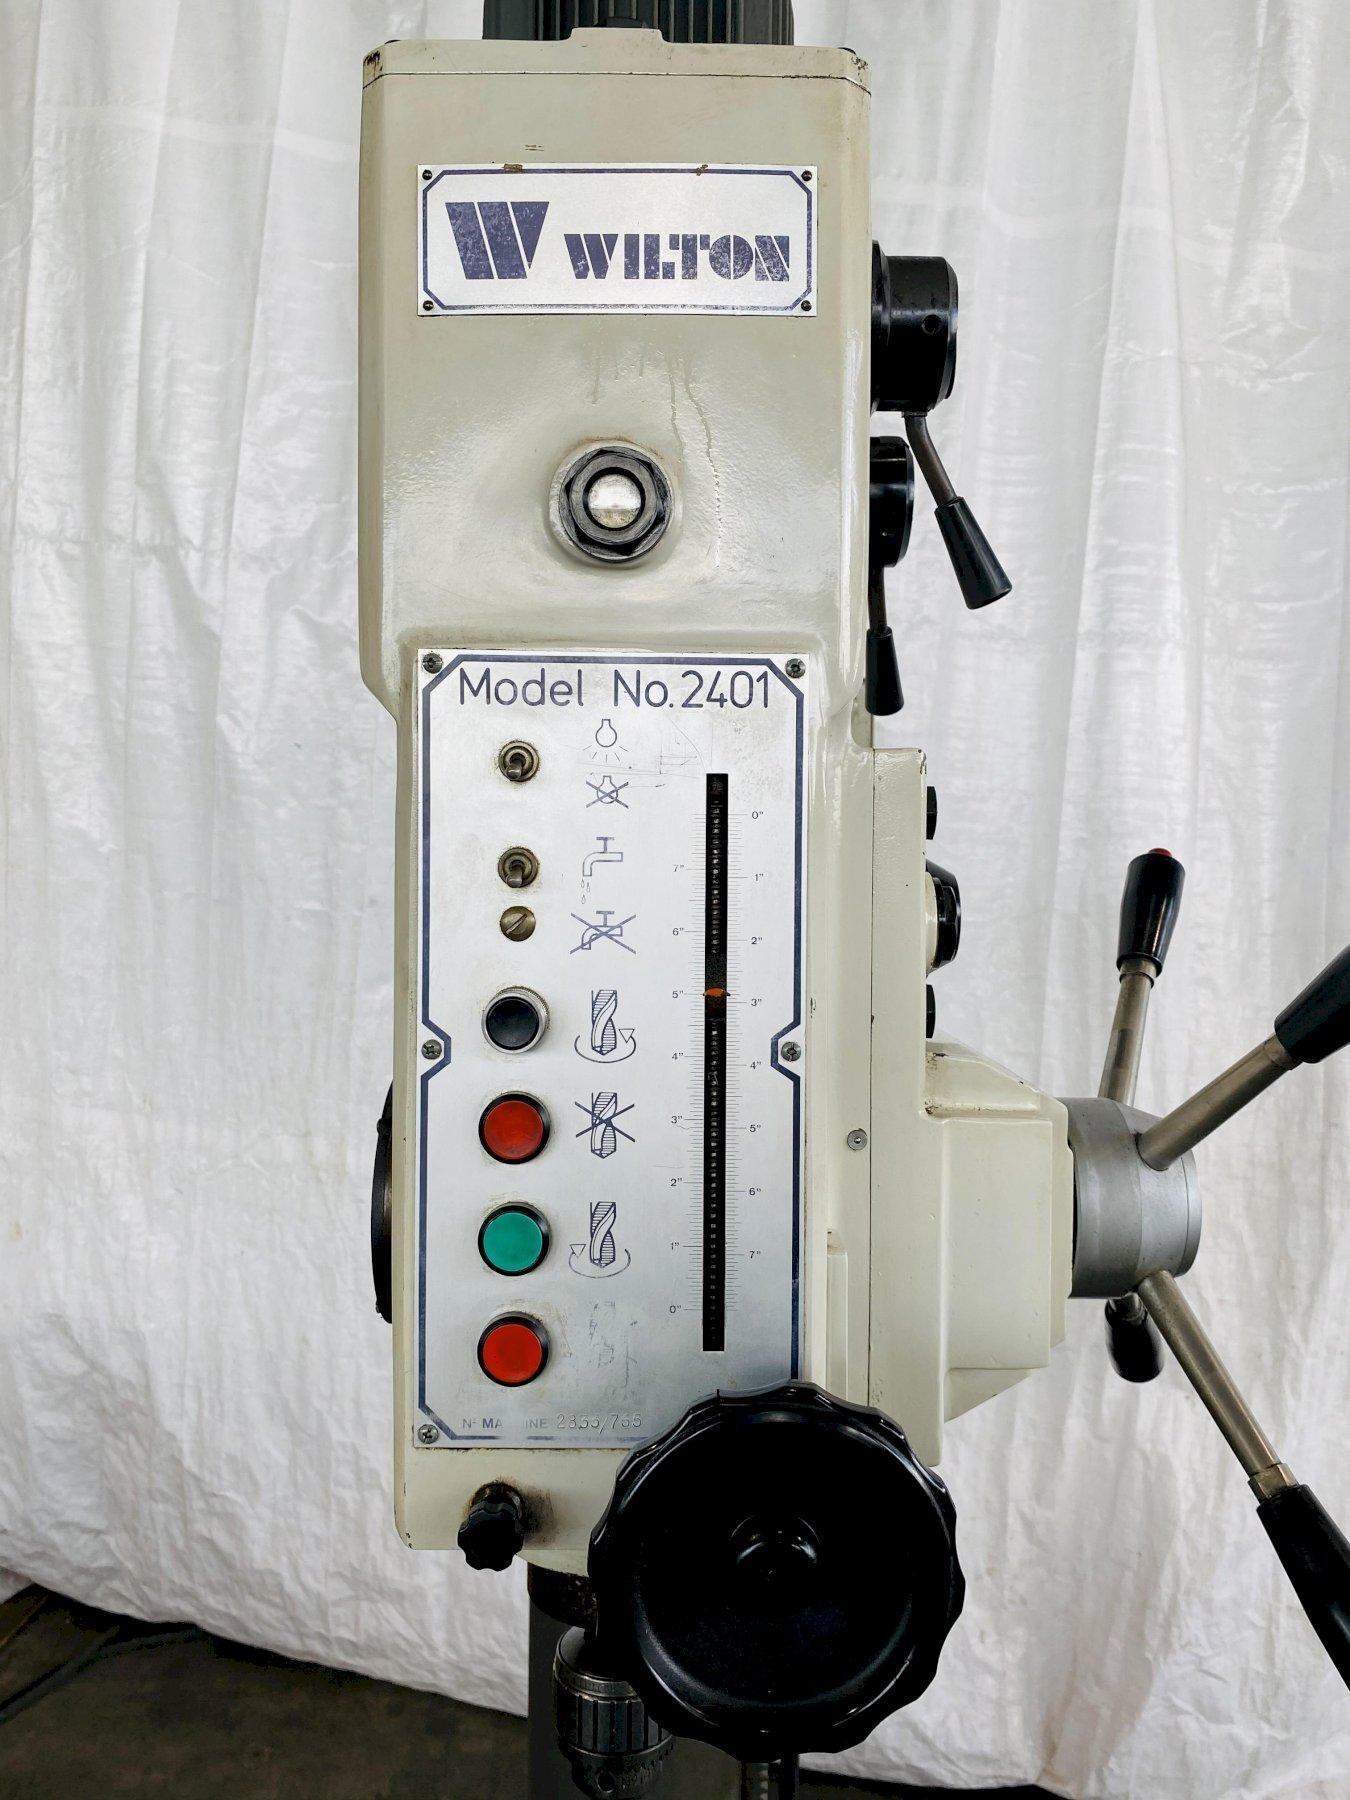 "34"" WILTON 2401 AUTOMATIC FEED DRILL PRESS. STOCK # 0949720"